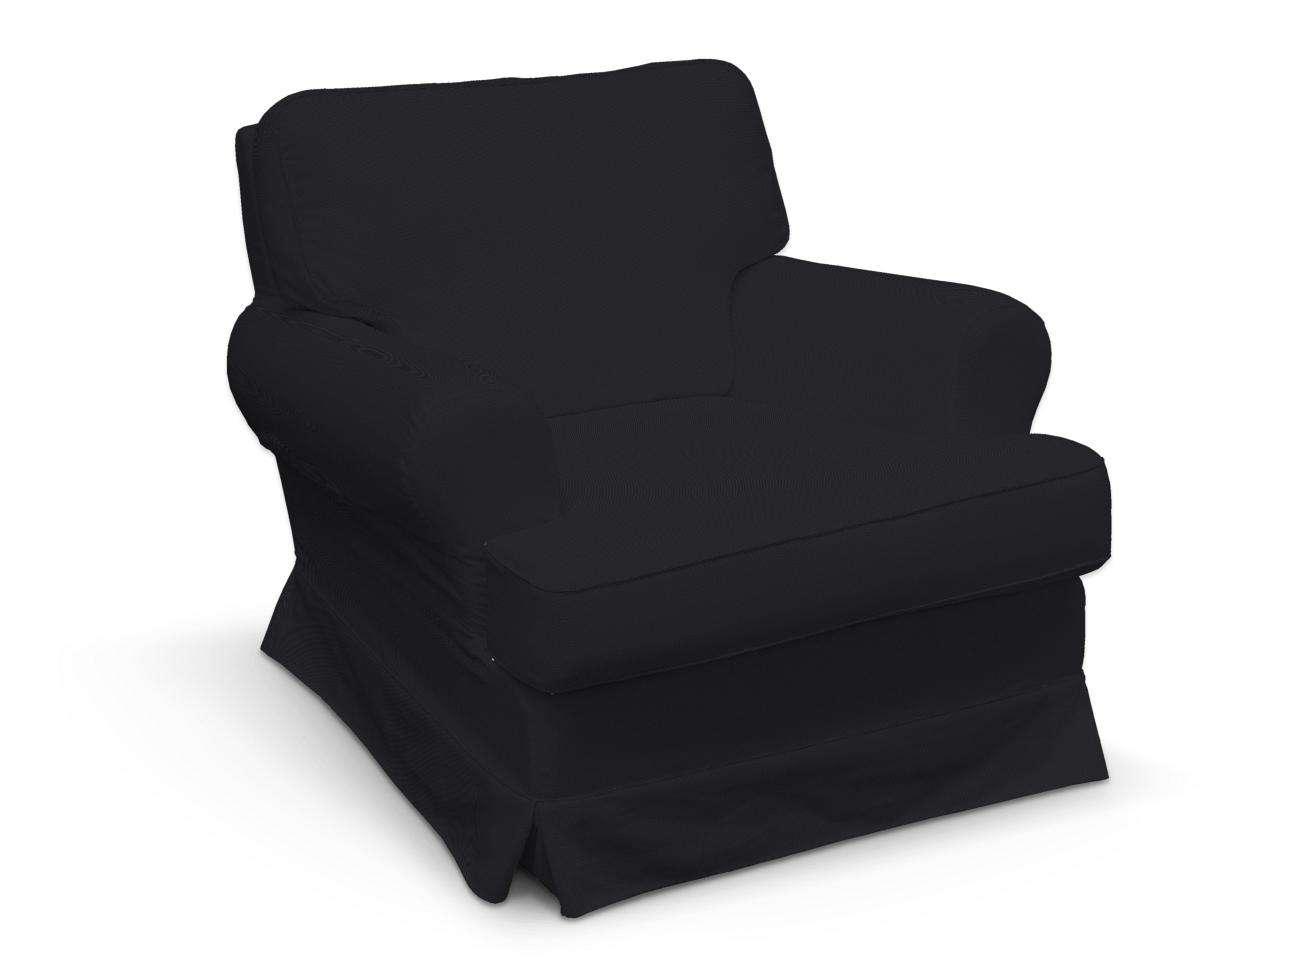 Barkaby Sesselbezug von der Kollektion Etna, Stoff: 705-00